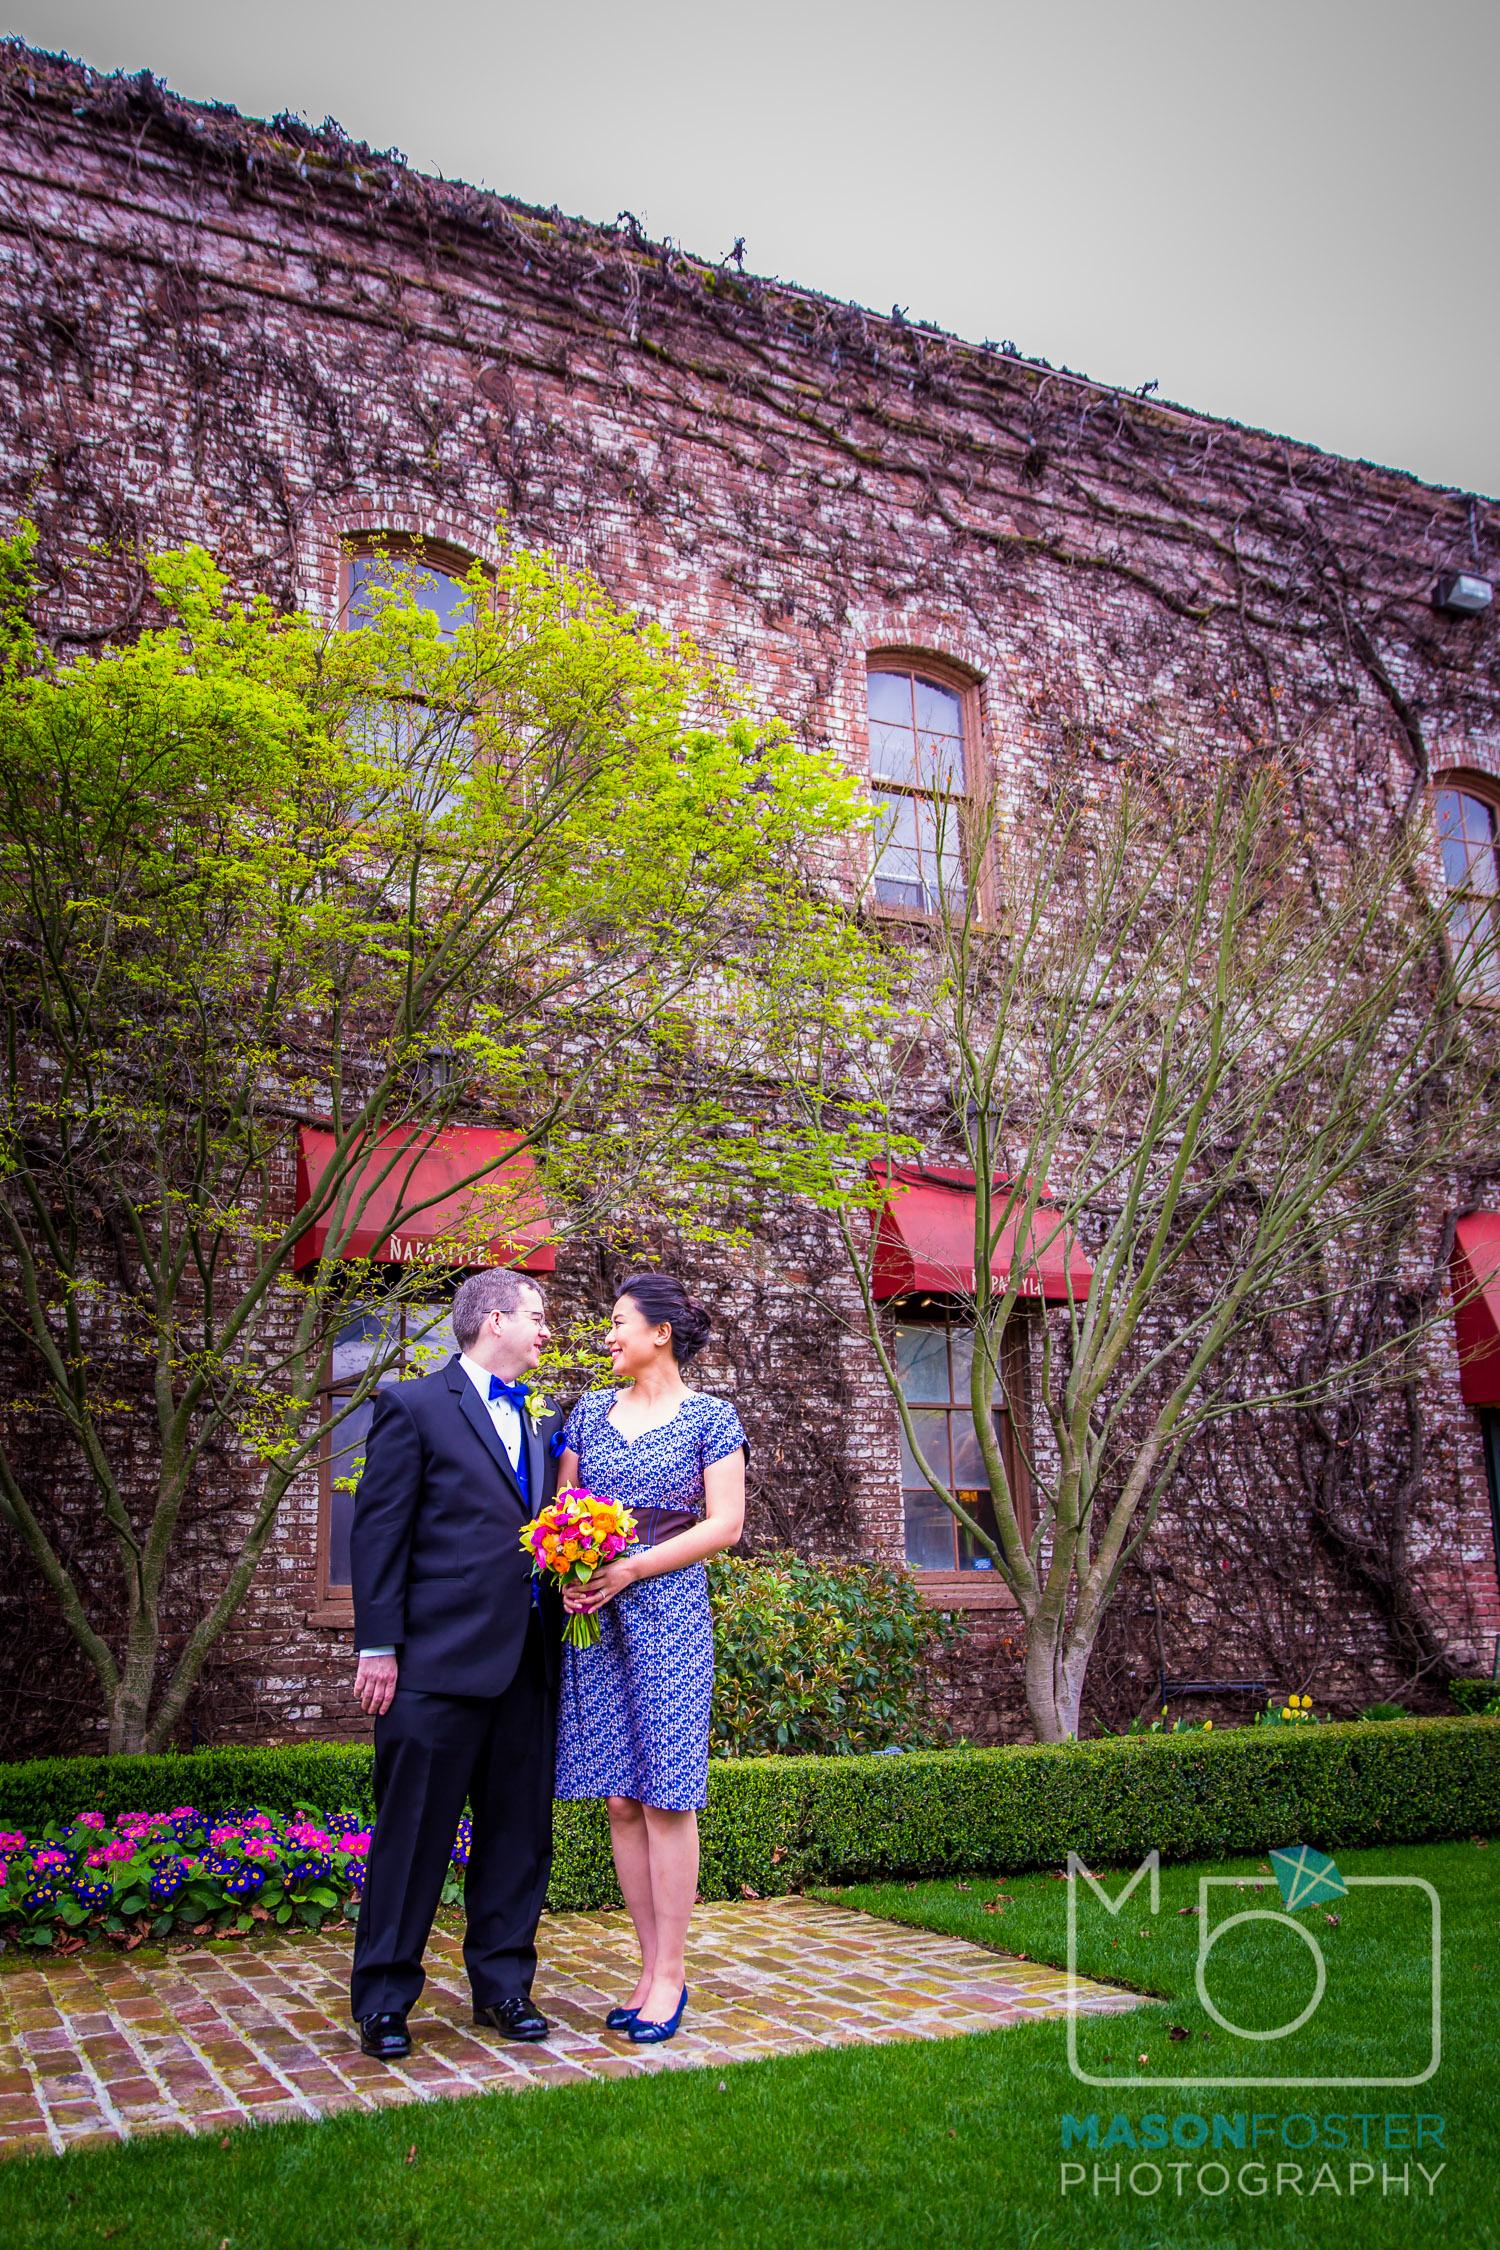 Wedding portraits at beautiful Bottega Napa Valley in Yountville.